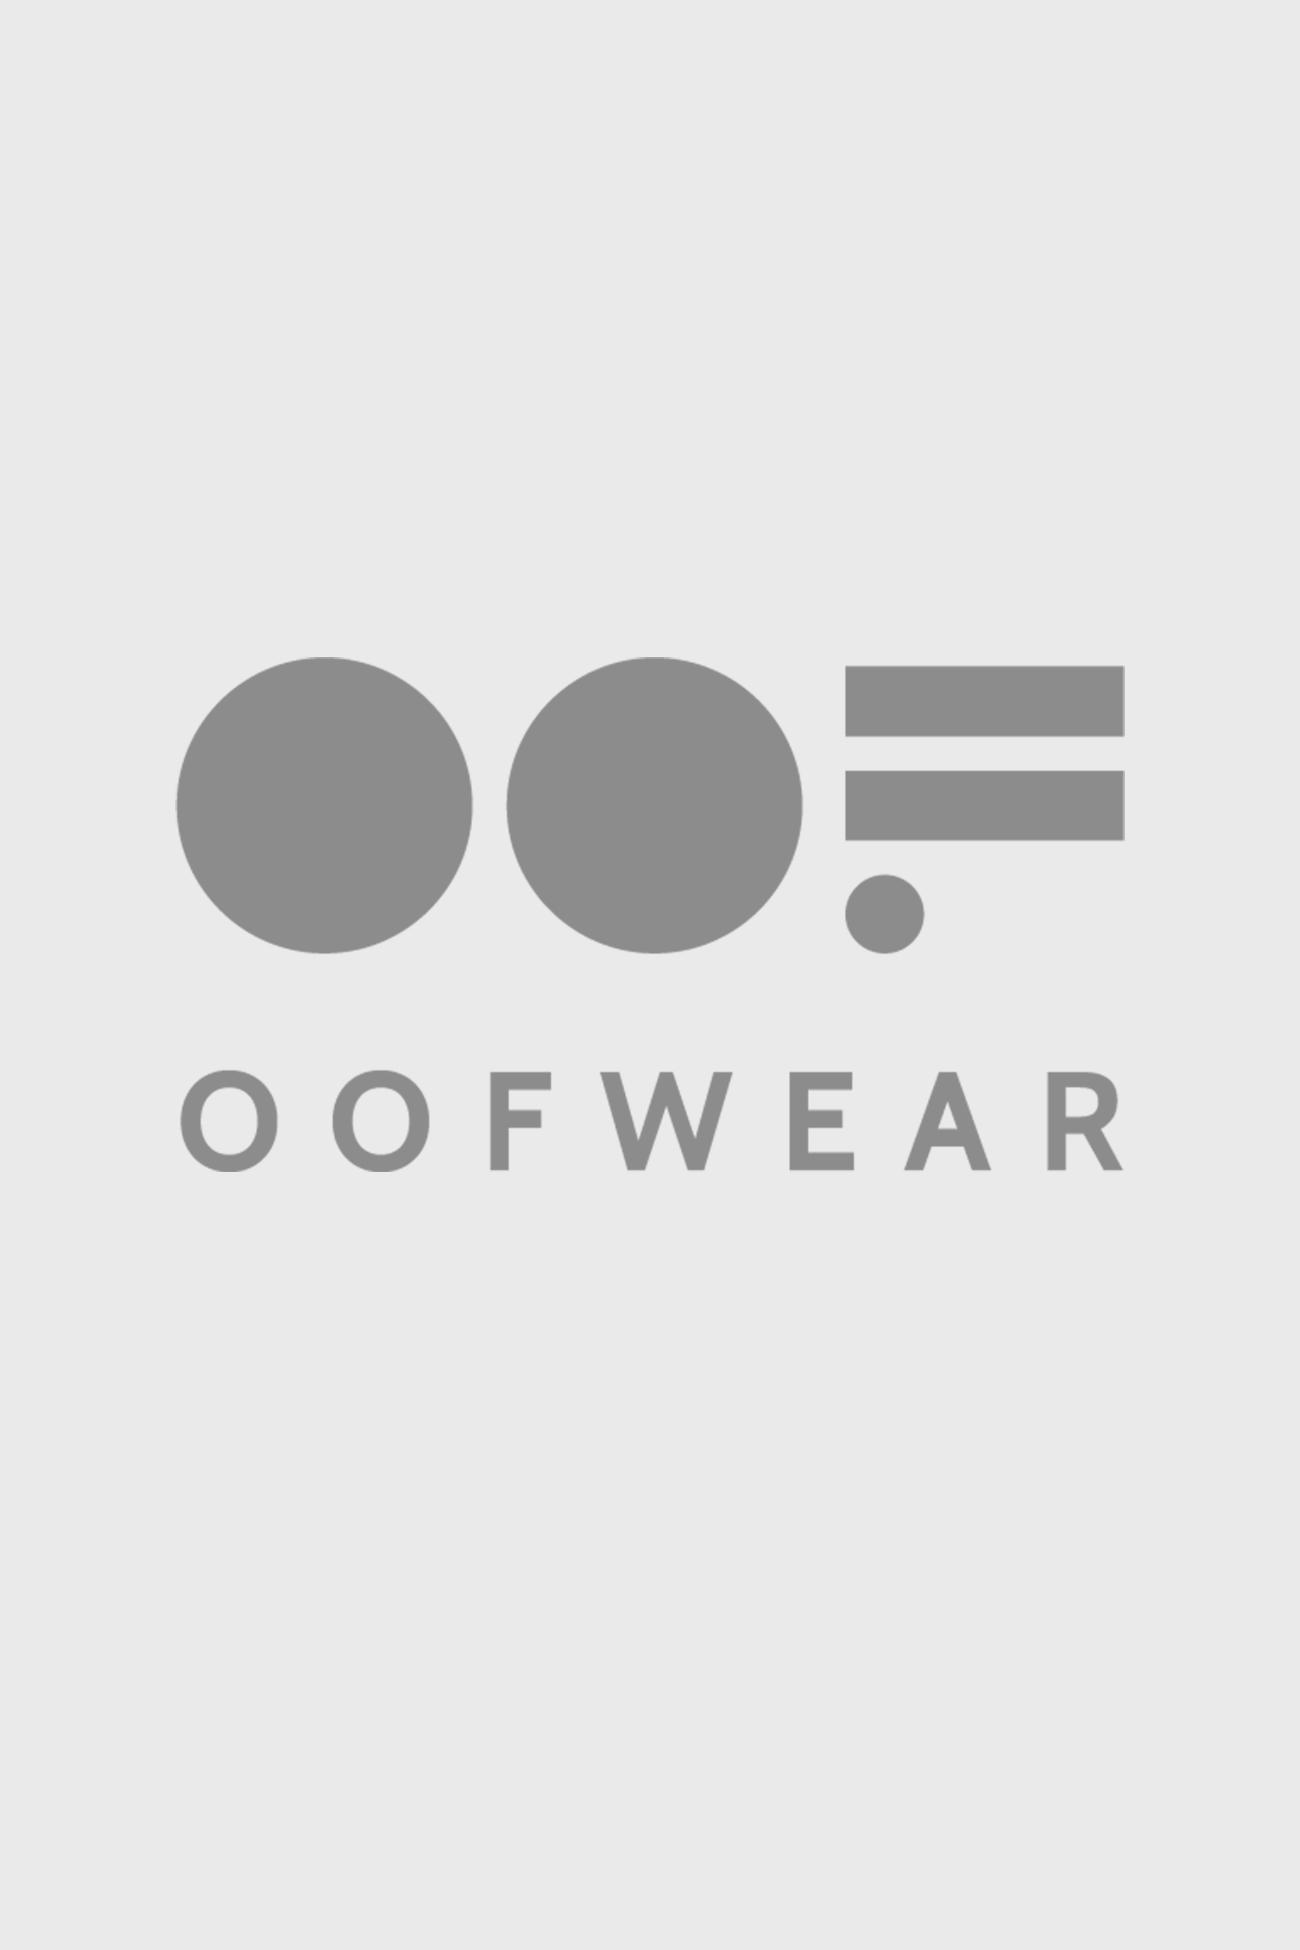 Men's shirt-style jacket in greige cotton blend